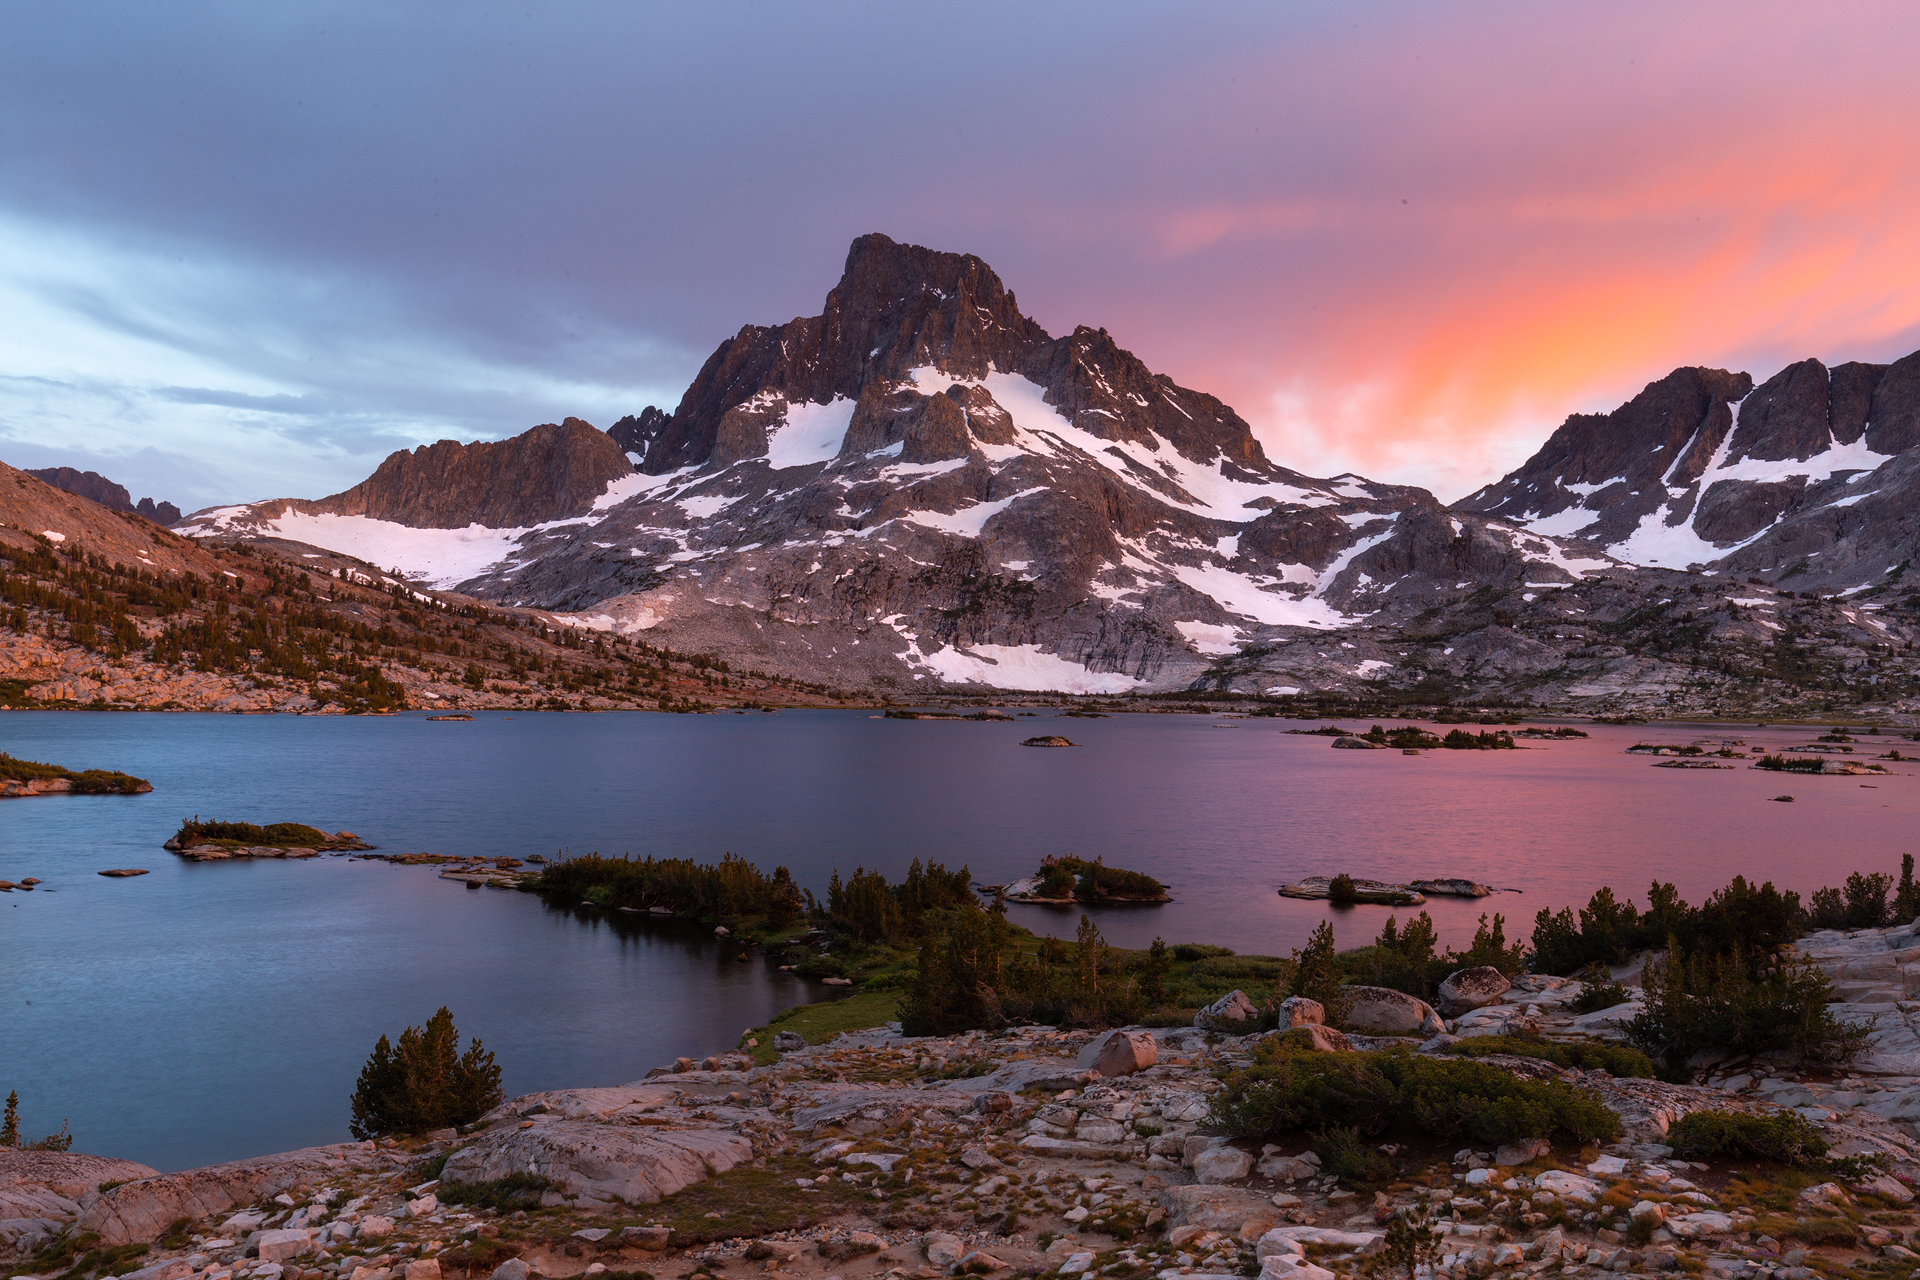 Sunset on Thousand Island Lake